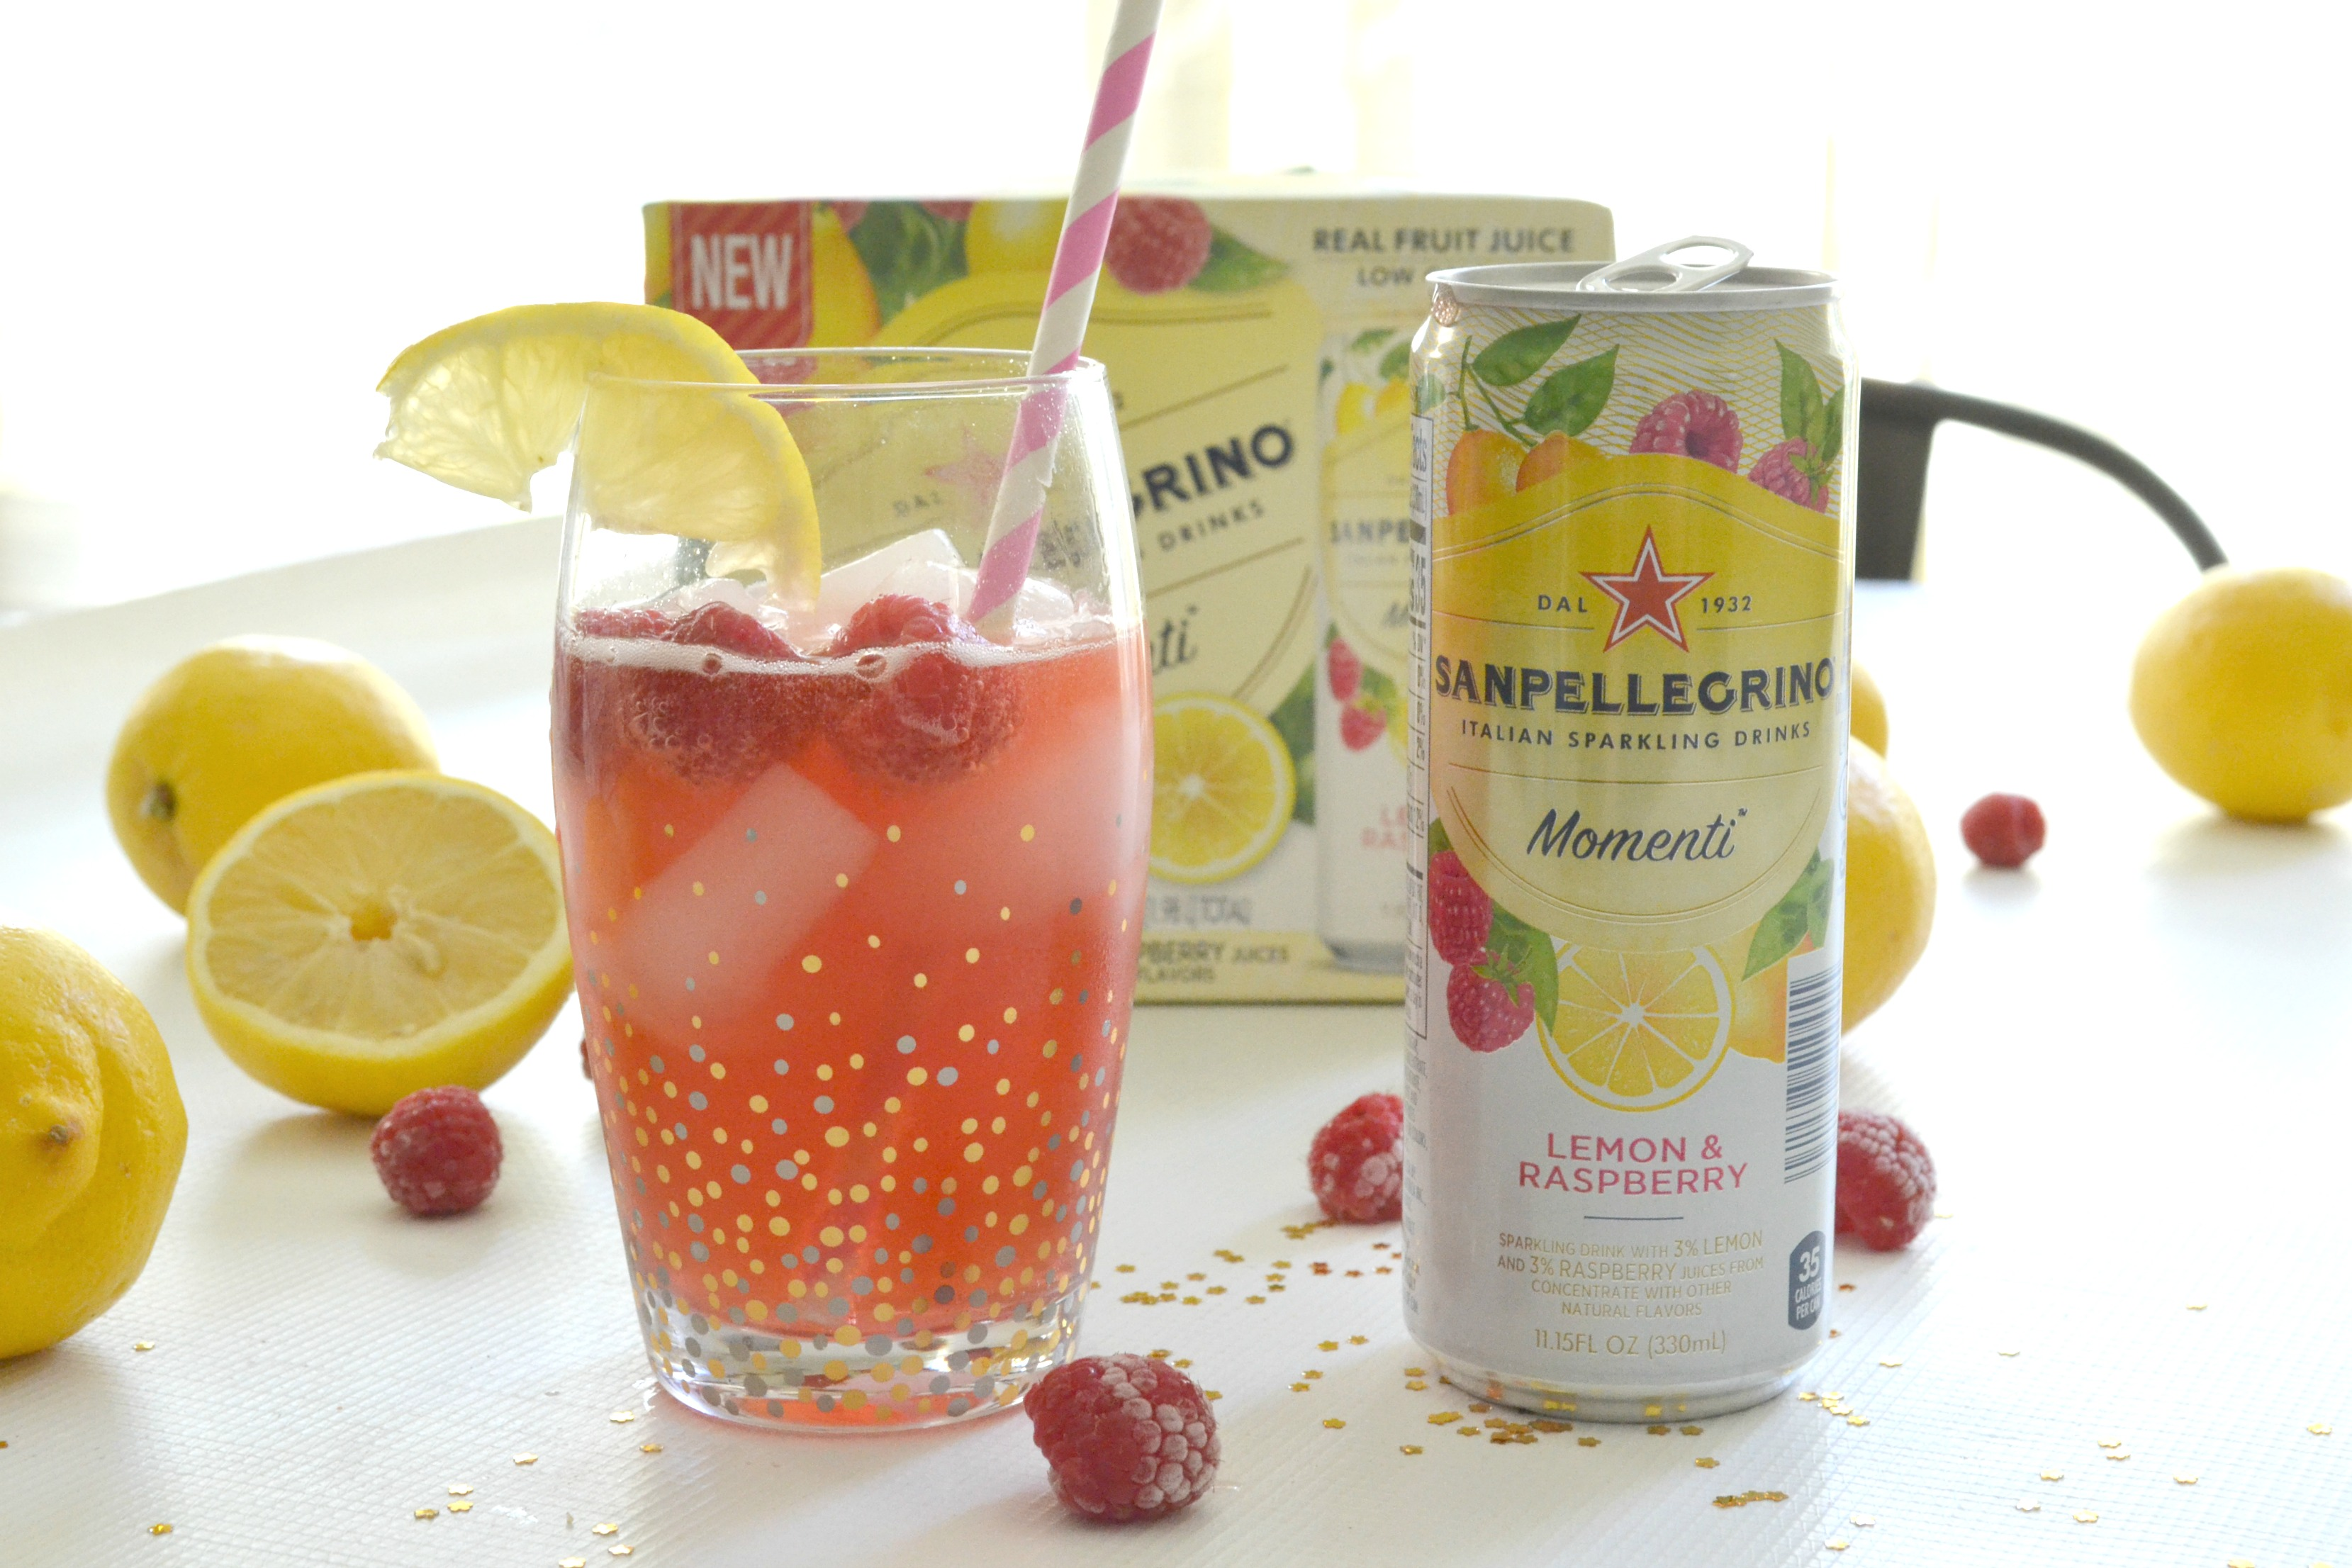 Lemon Raspberry Ice Cream Crumble Bars #MySanPelMomenti #TastefullyItalian